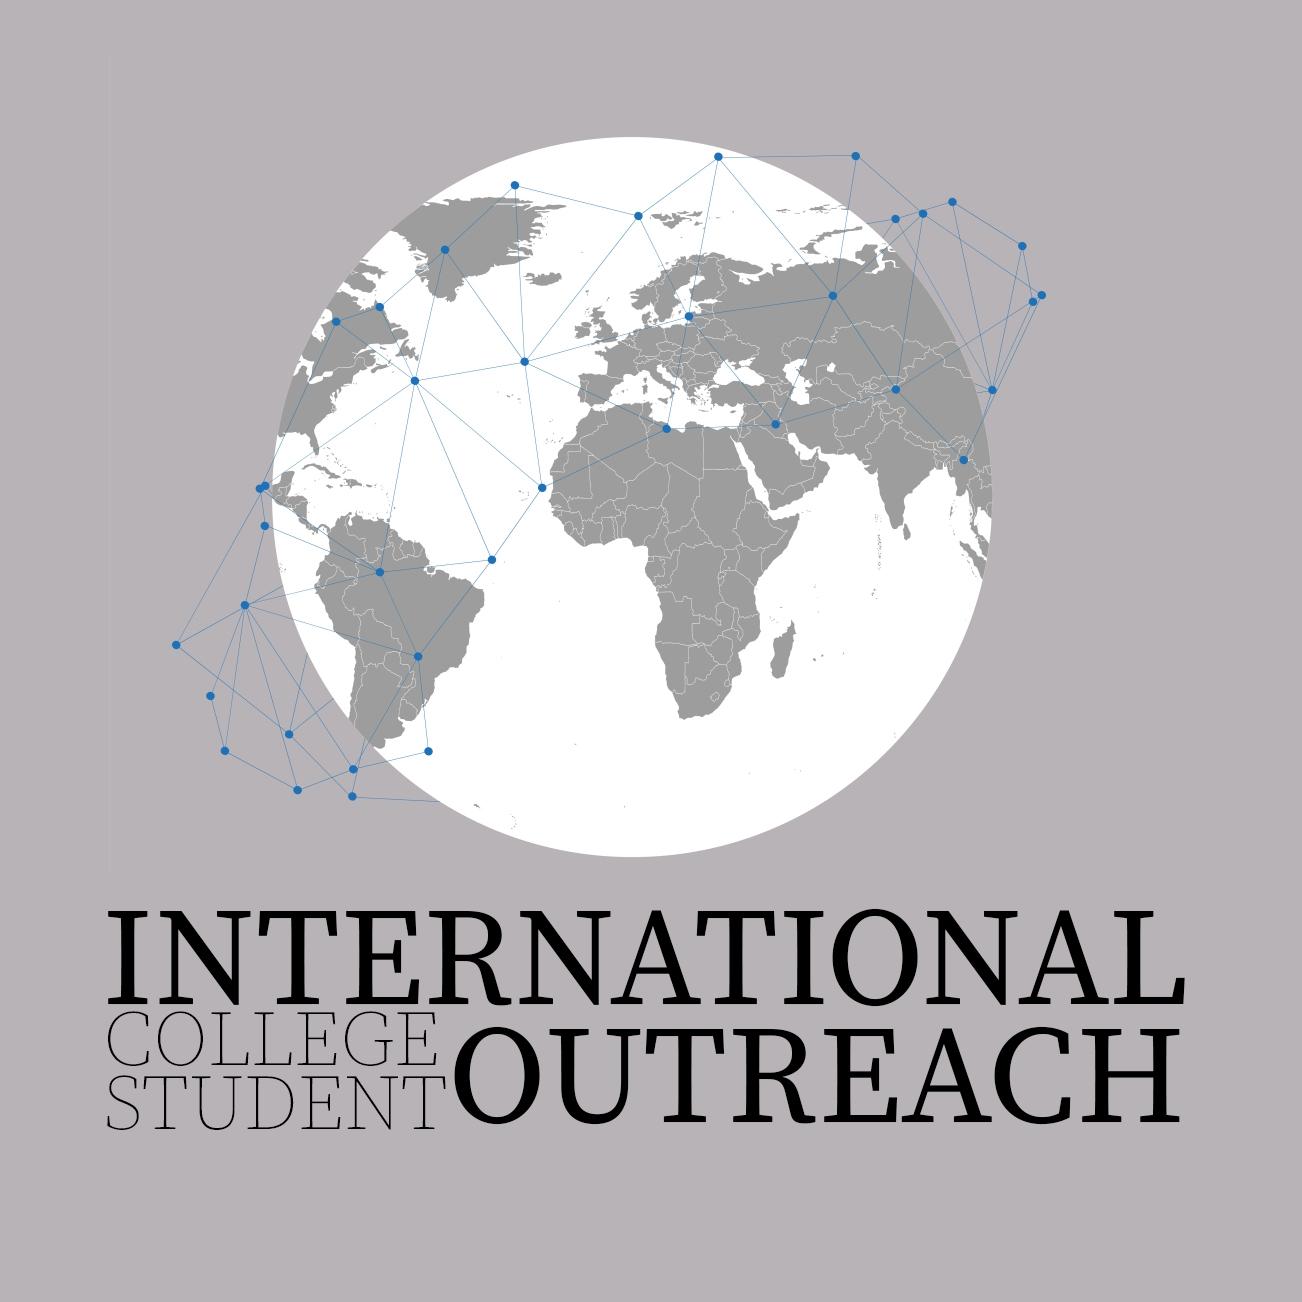 INTERNATIONAL OUTREACH.jpg